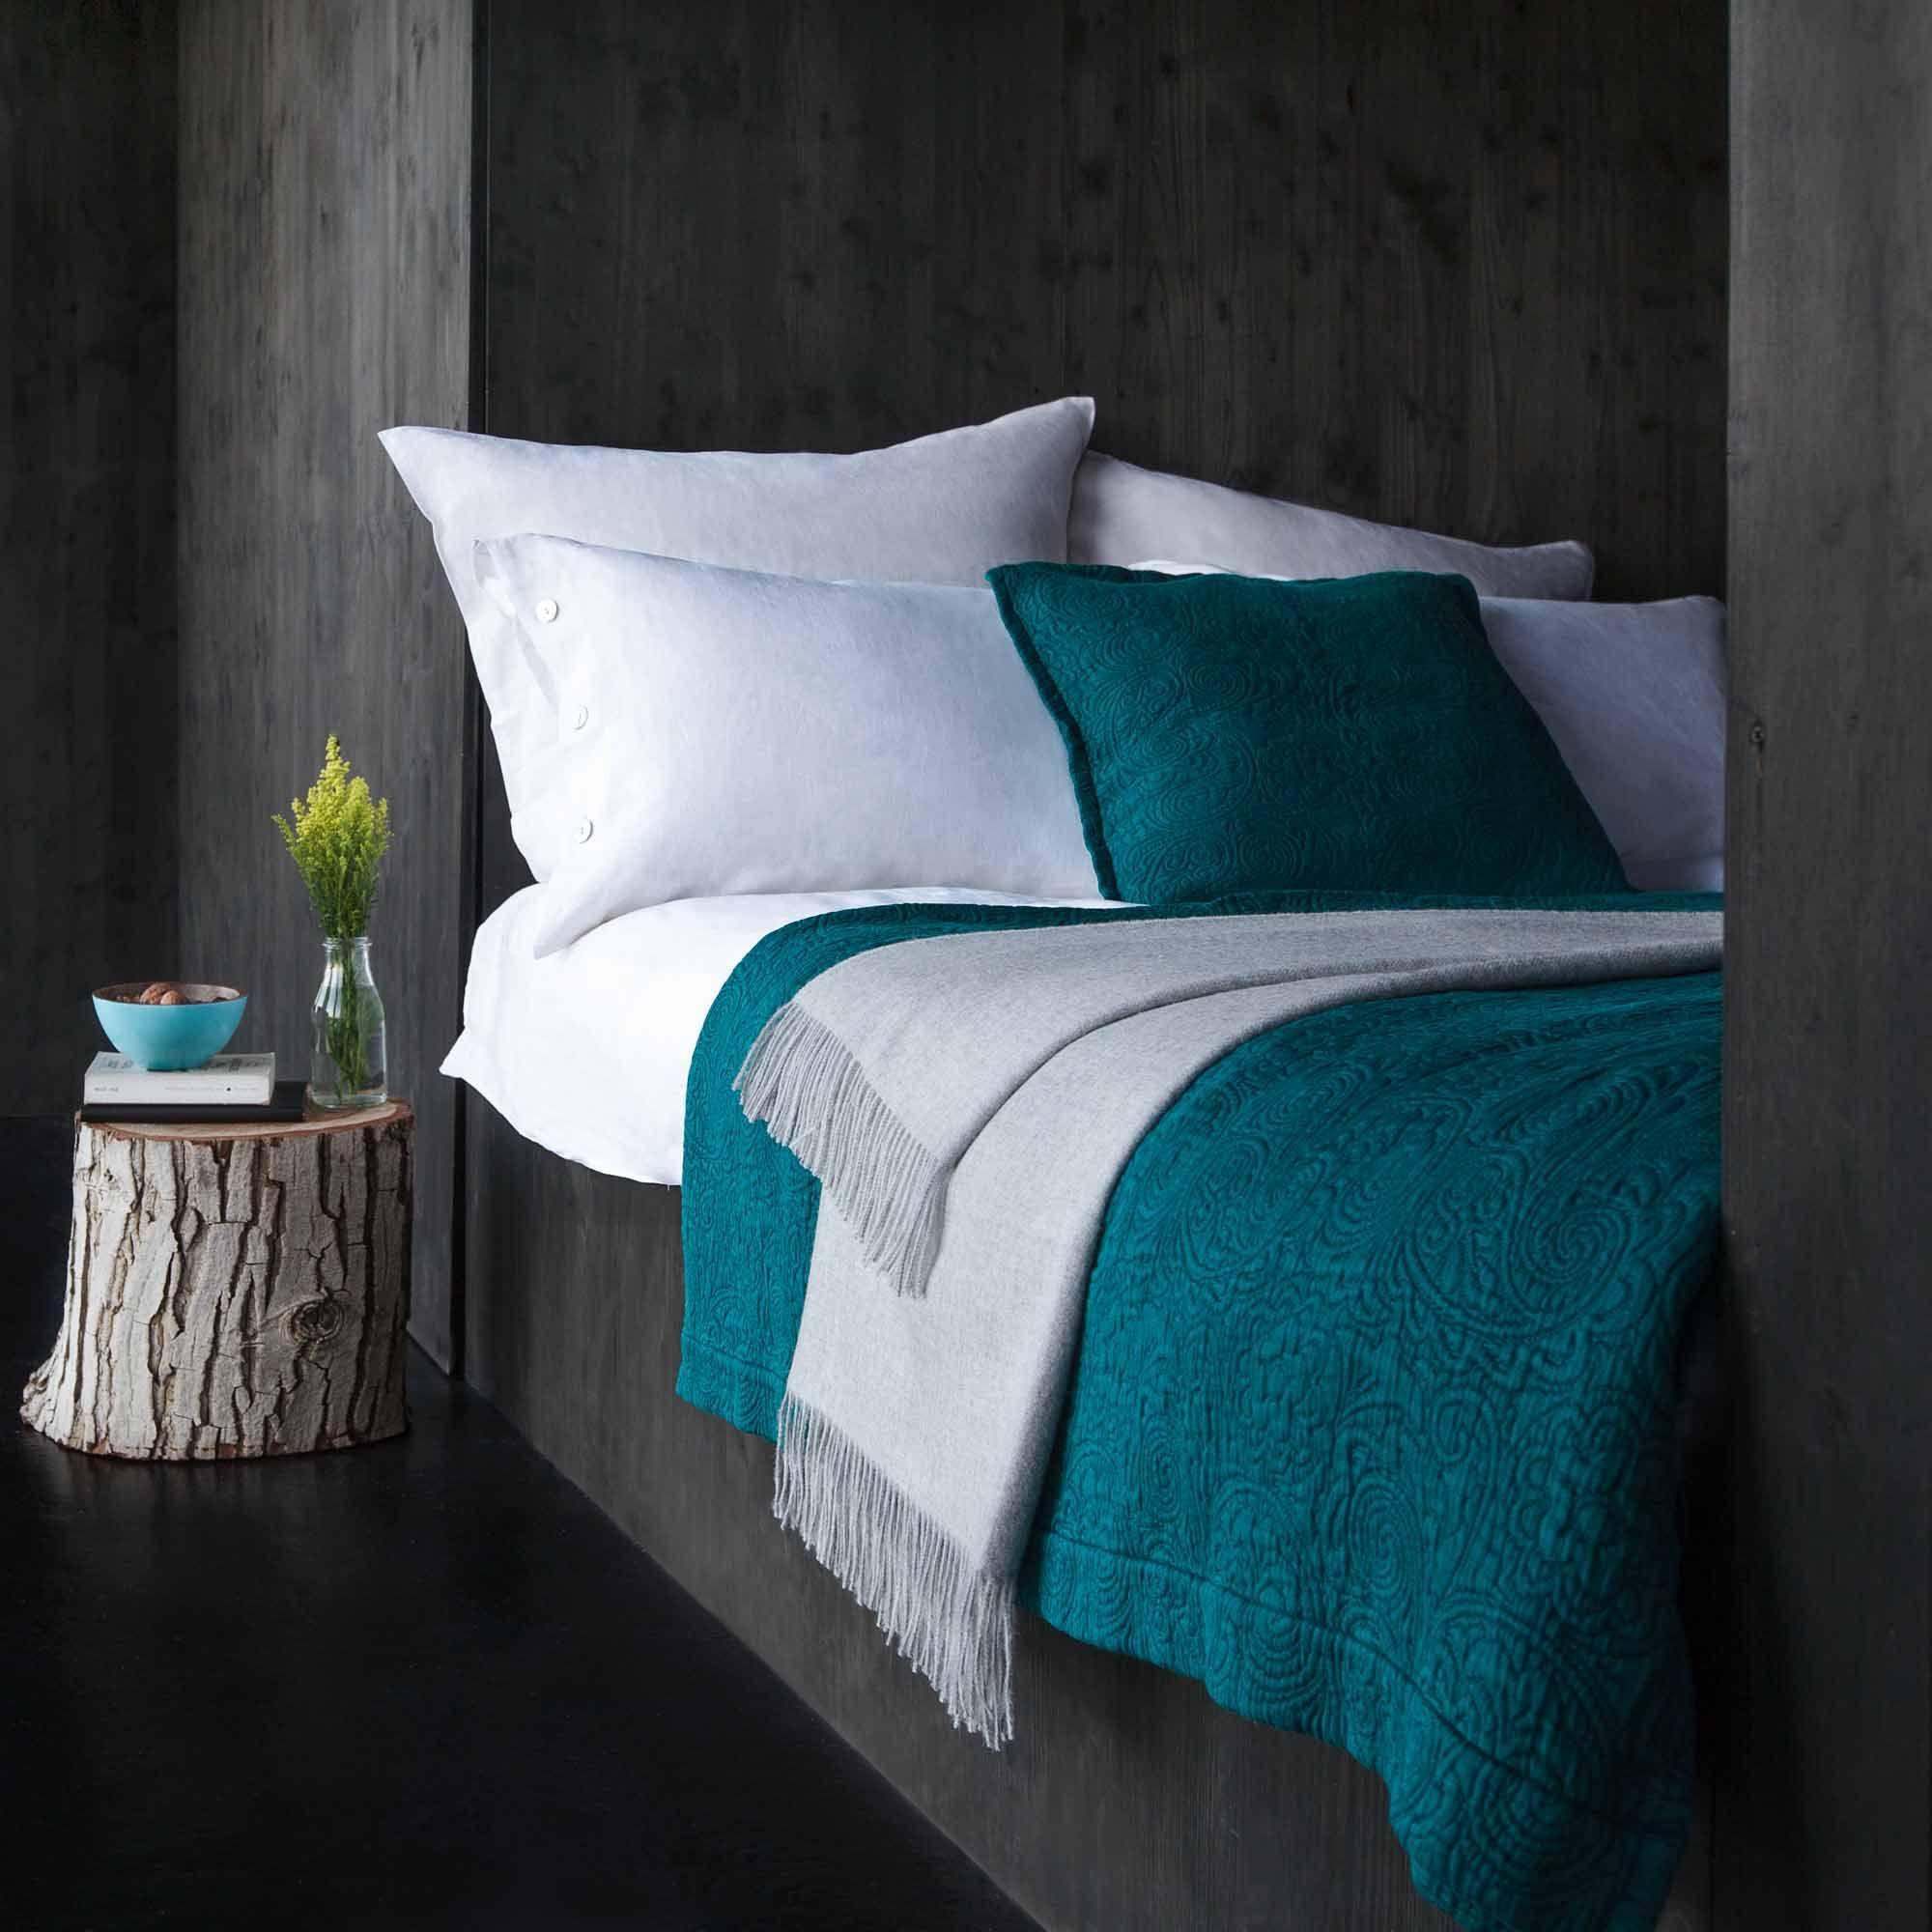 Bathroom Teal Bedroom Decor Elegant Black And White Bed Sp Gray